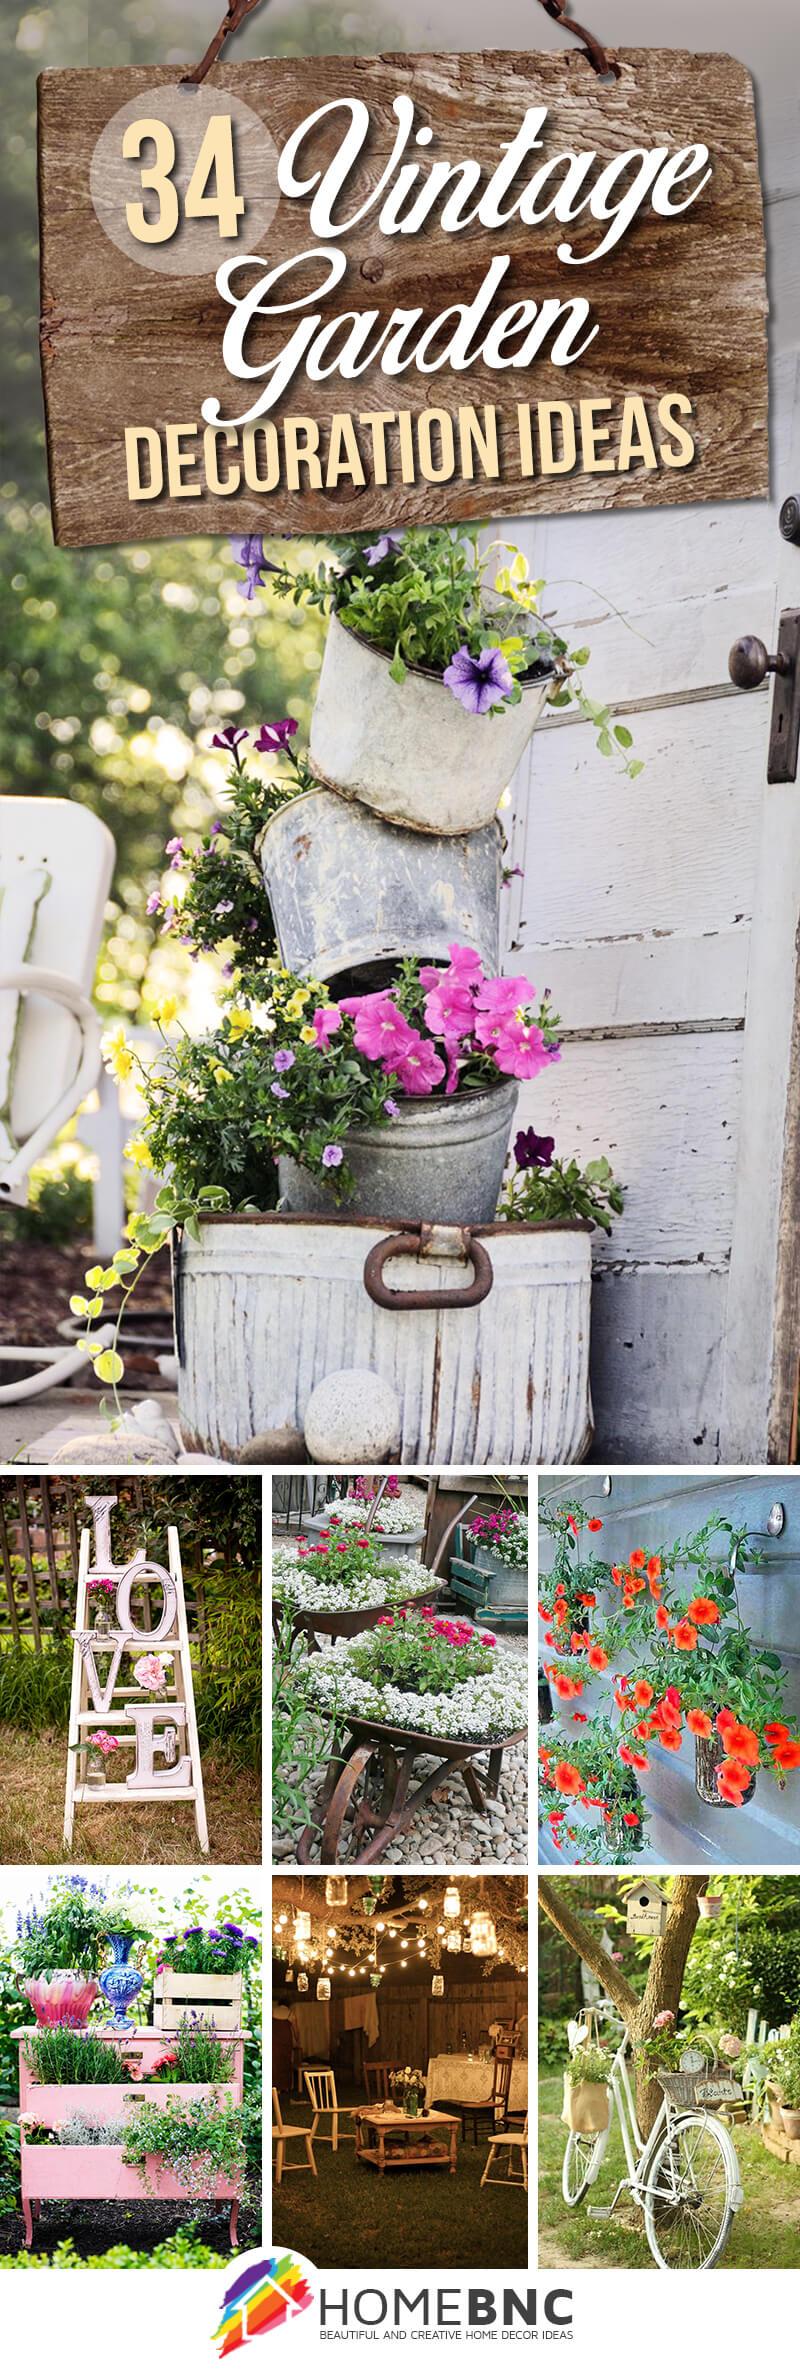 garden decorations ideas 61